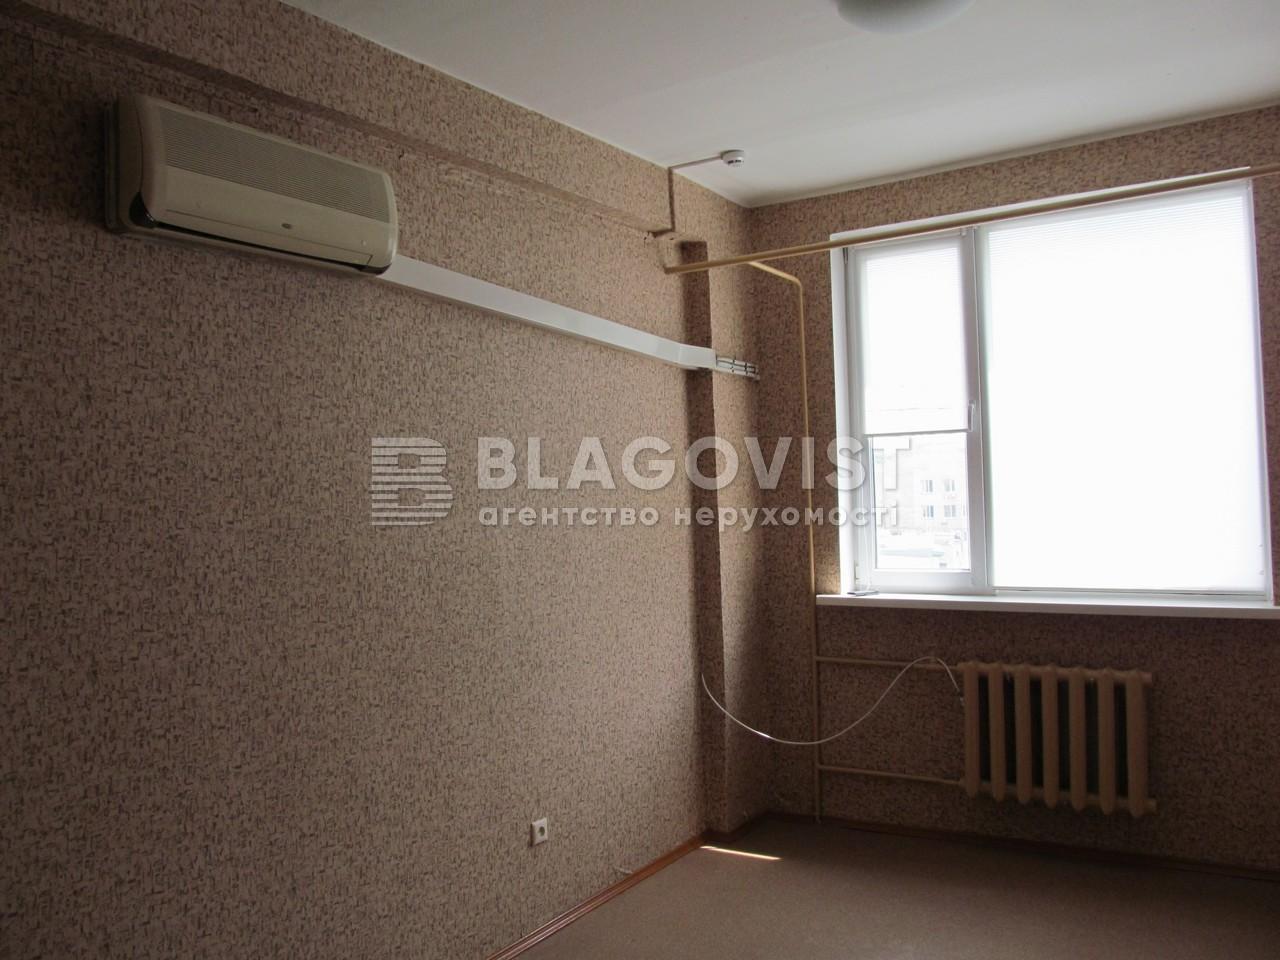 Офисно-складское помещение, F-33728, Скляренко Семена, Киев - Фото 12